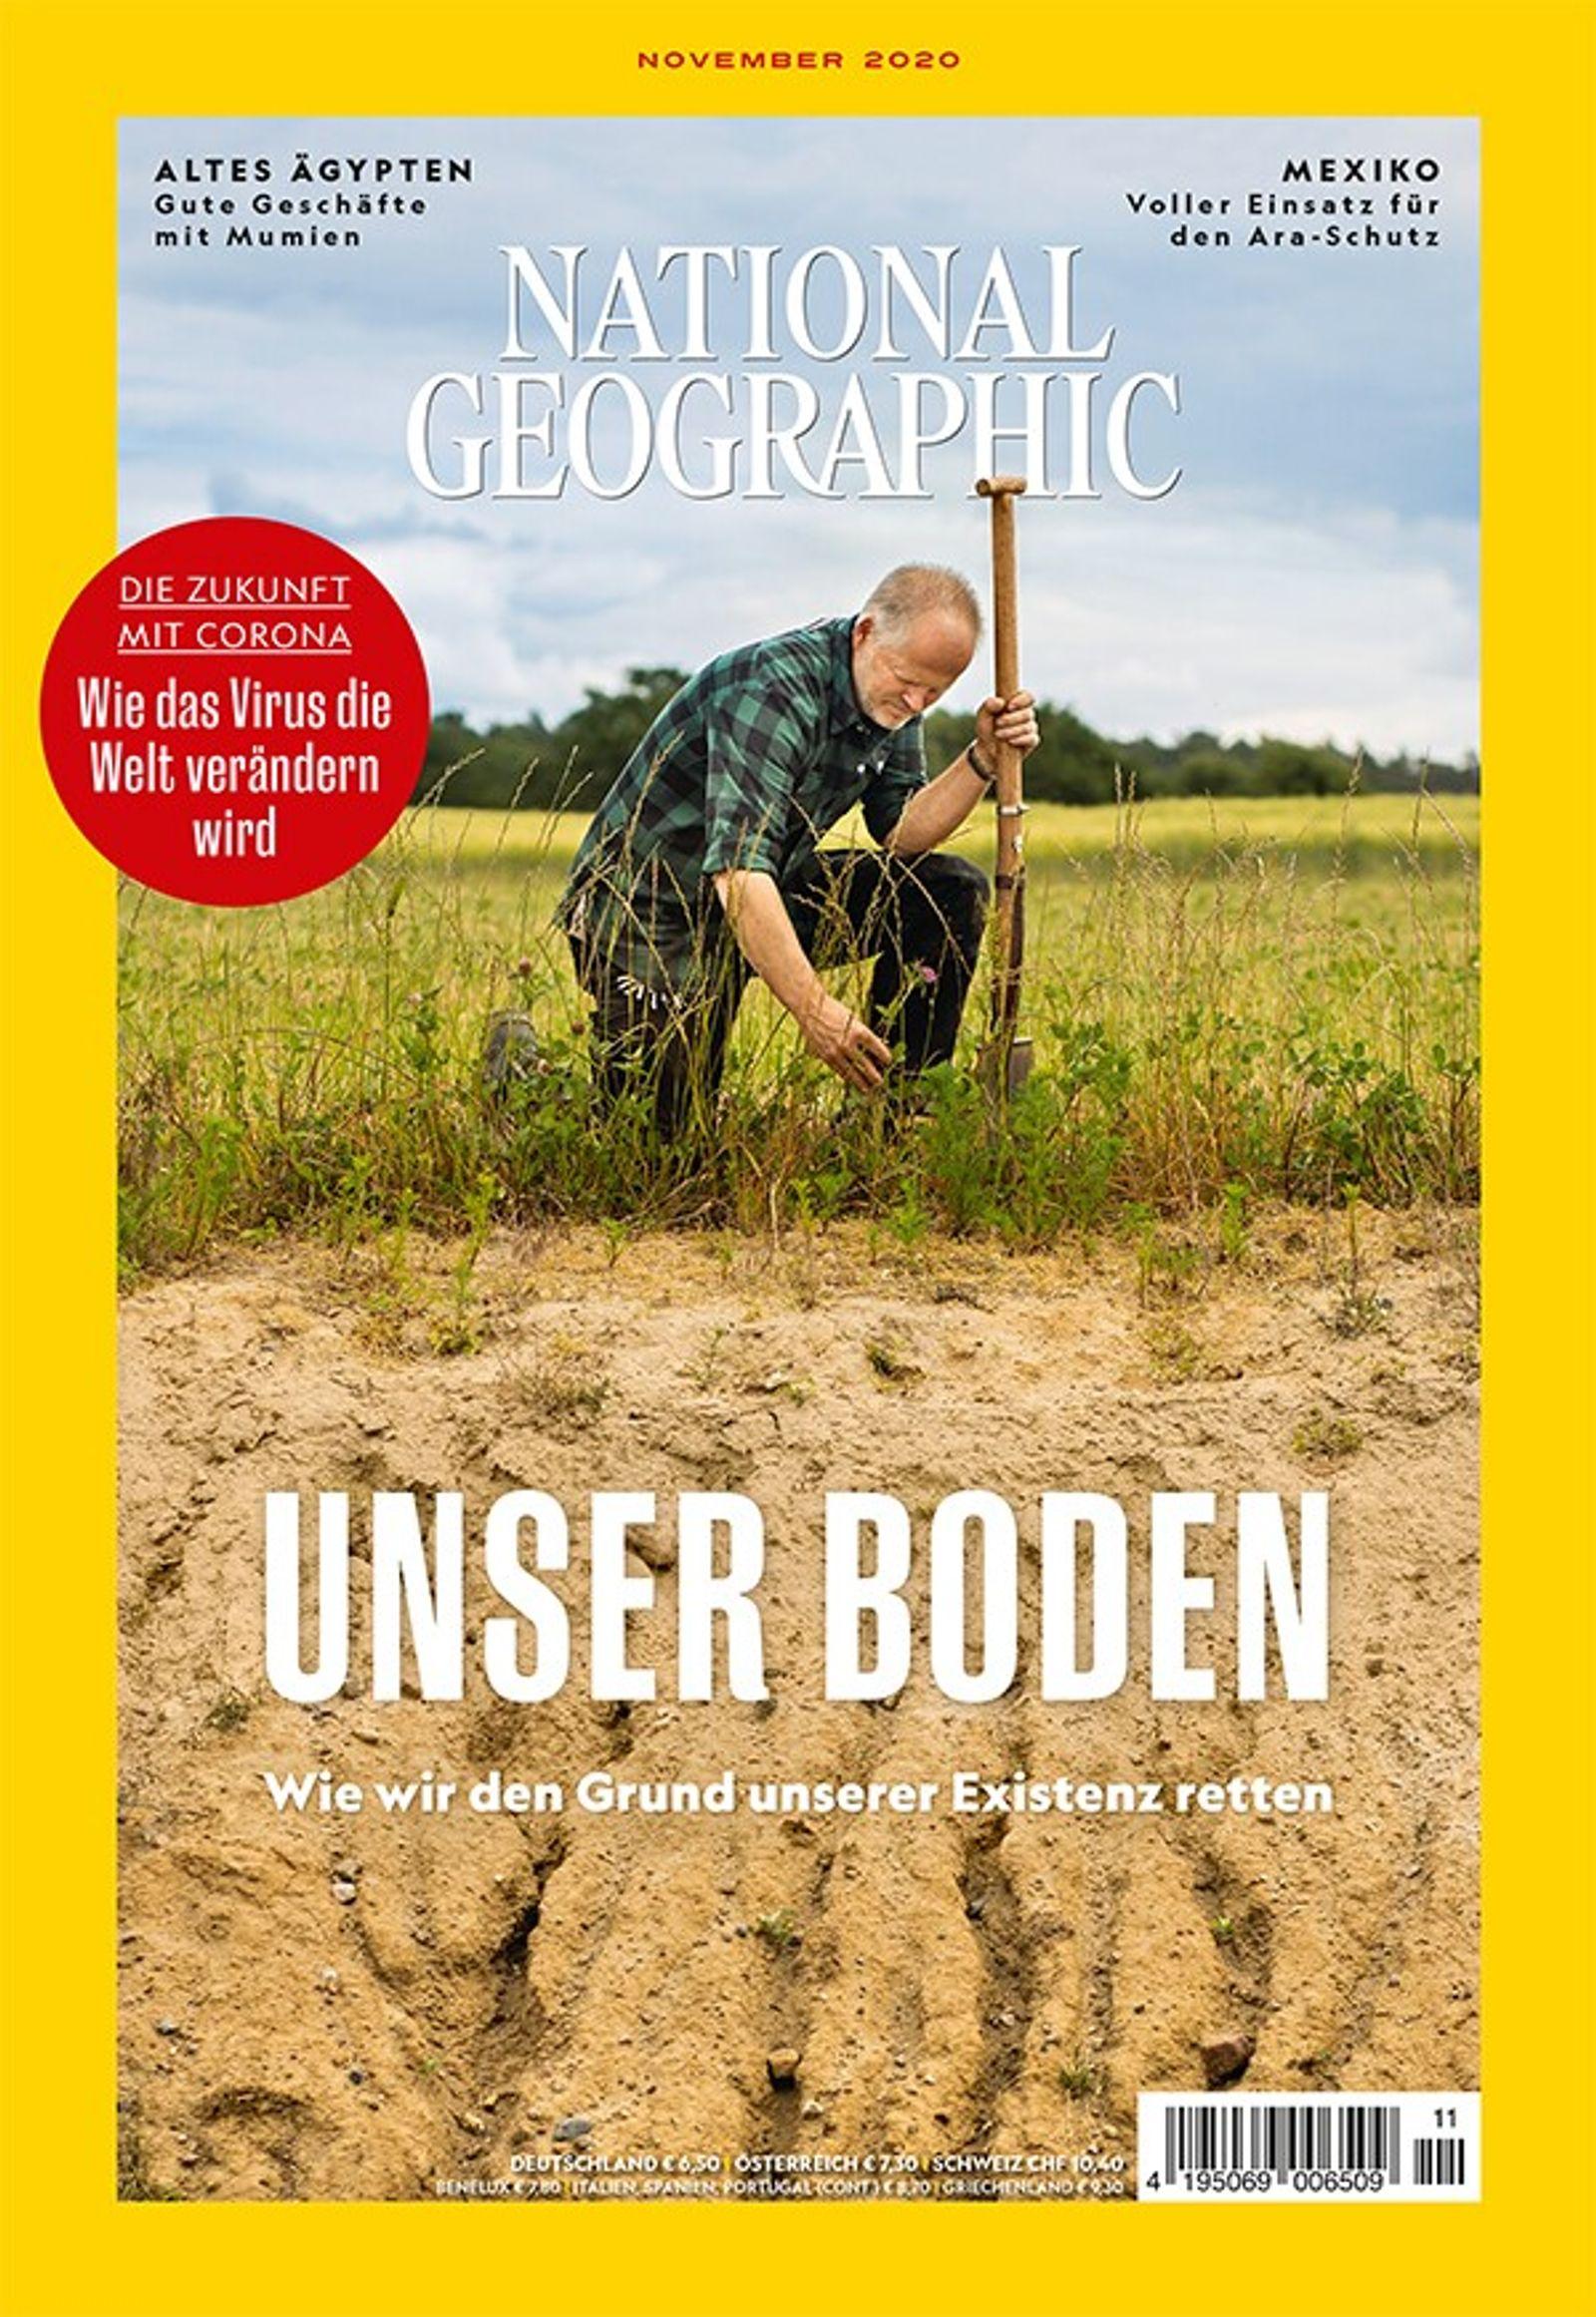 National Geographic-Magazin November 2020, Titelthema: Boden